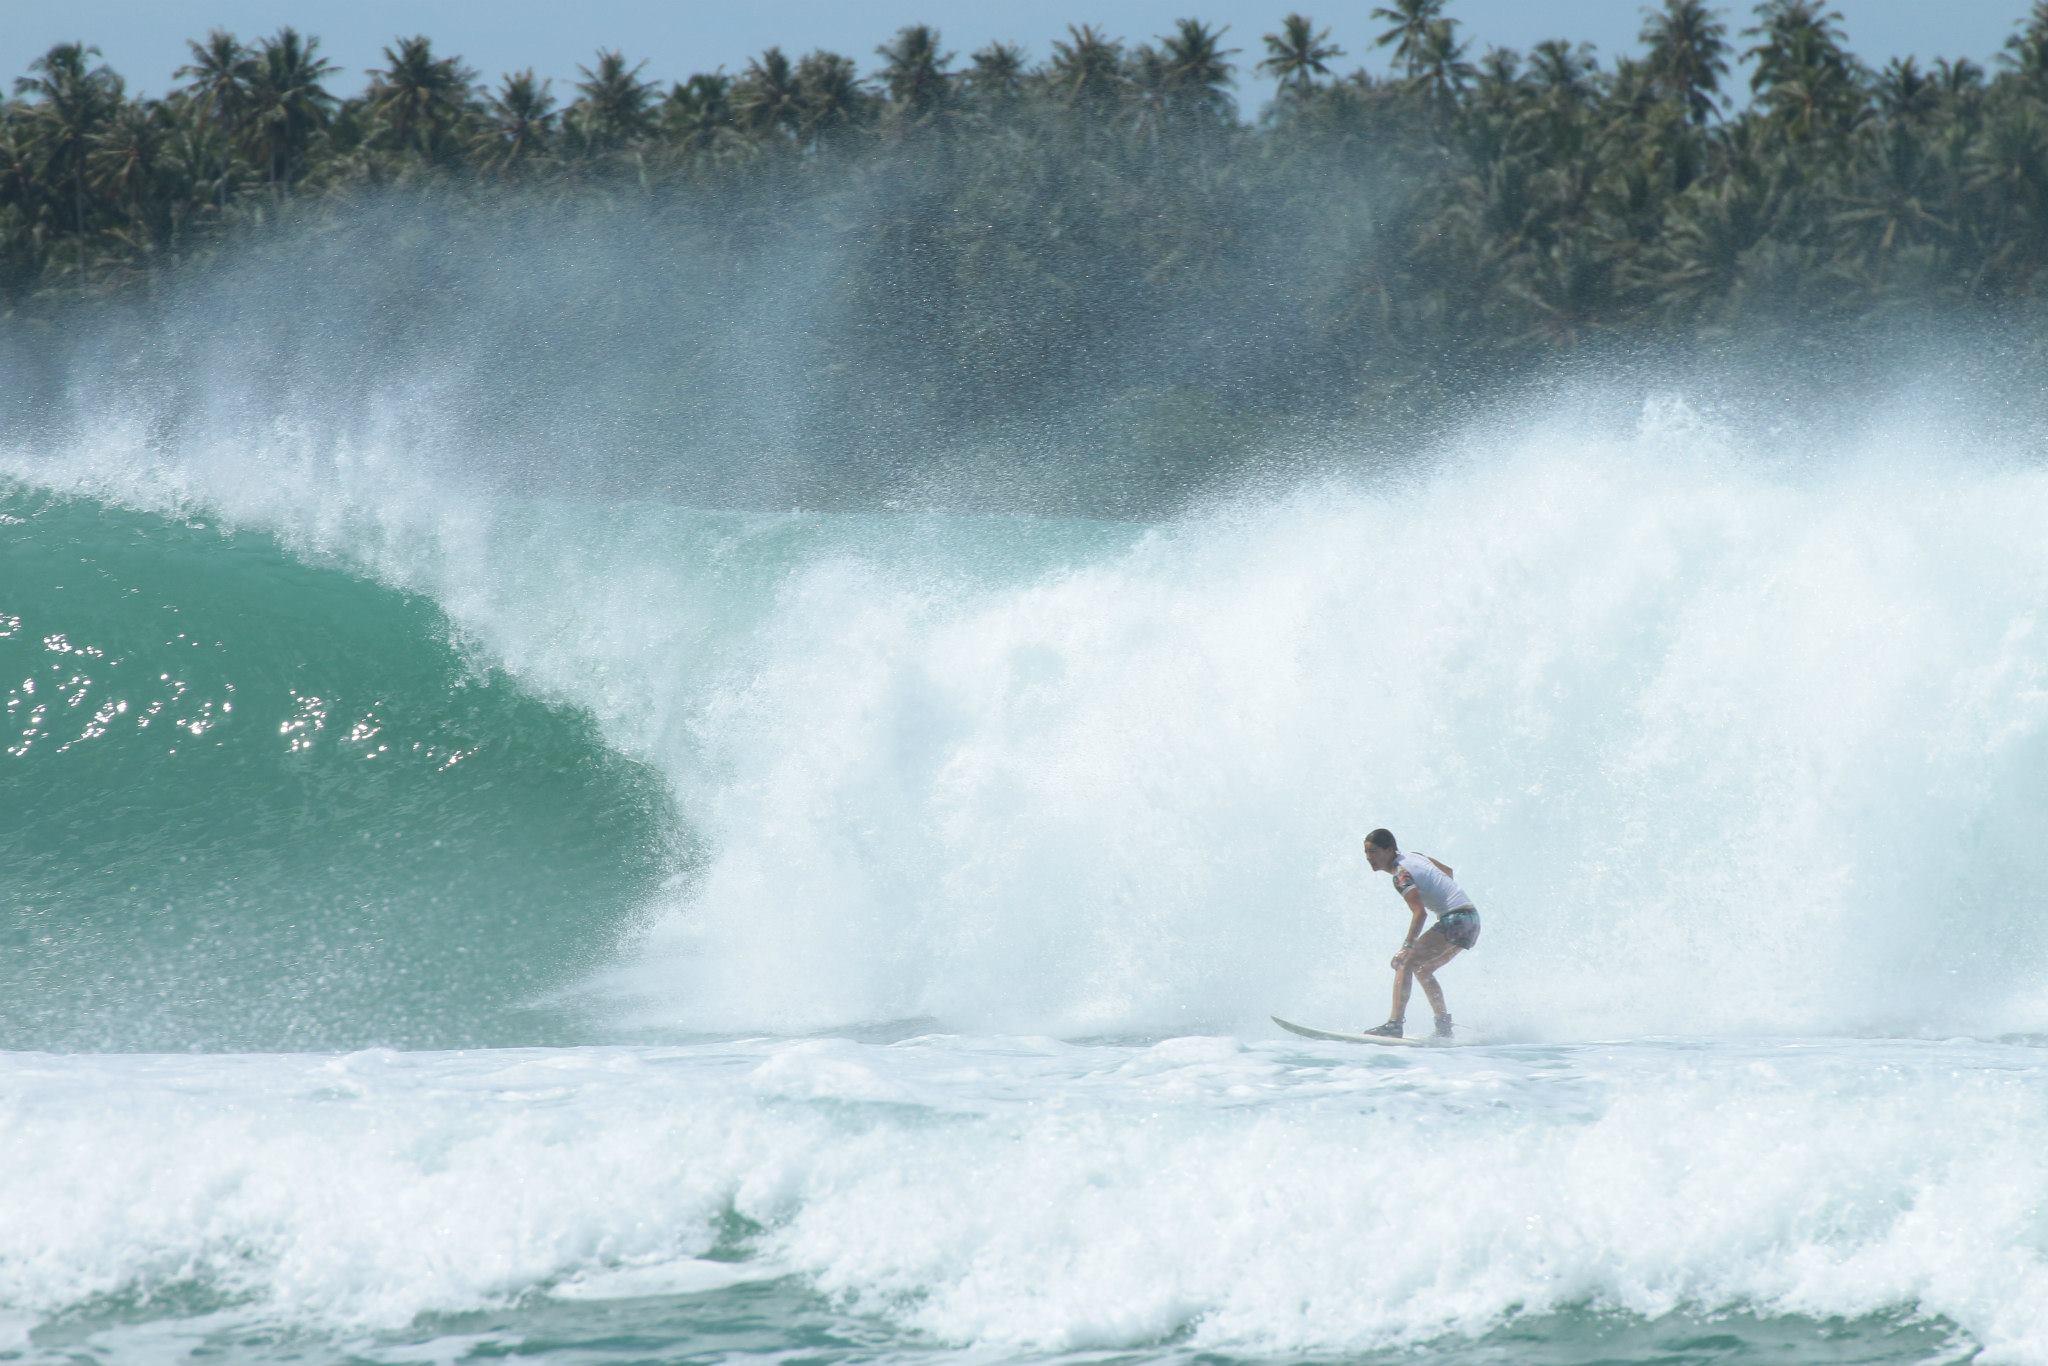 Late take off, Tube nias, Indonésie, surfeuse, surf fille blog